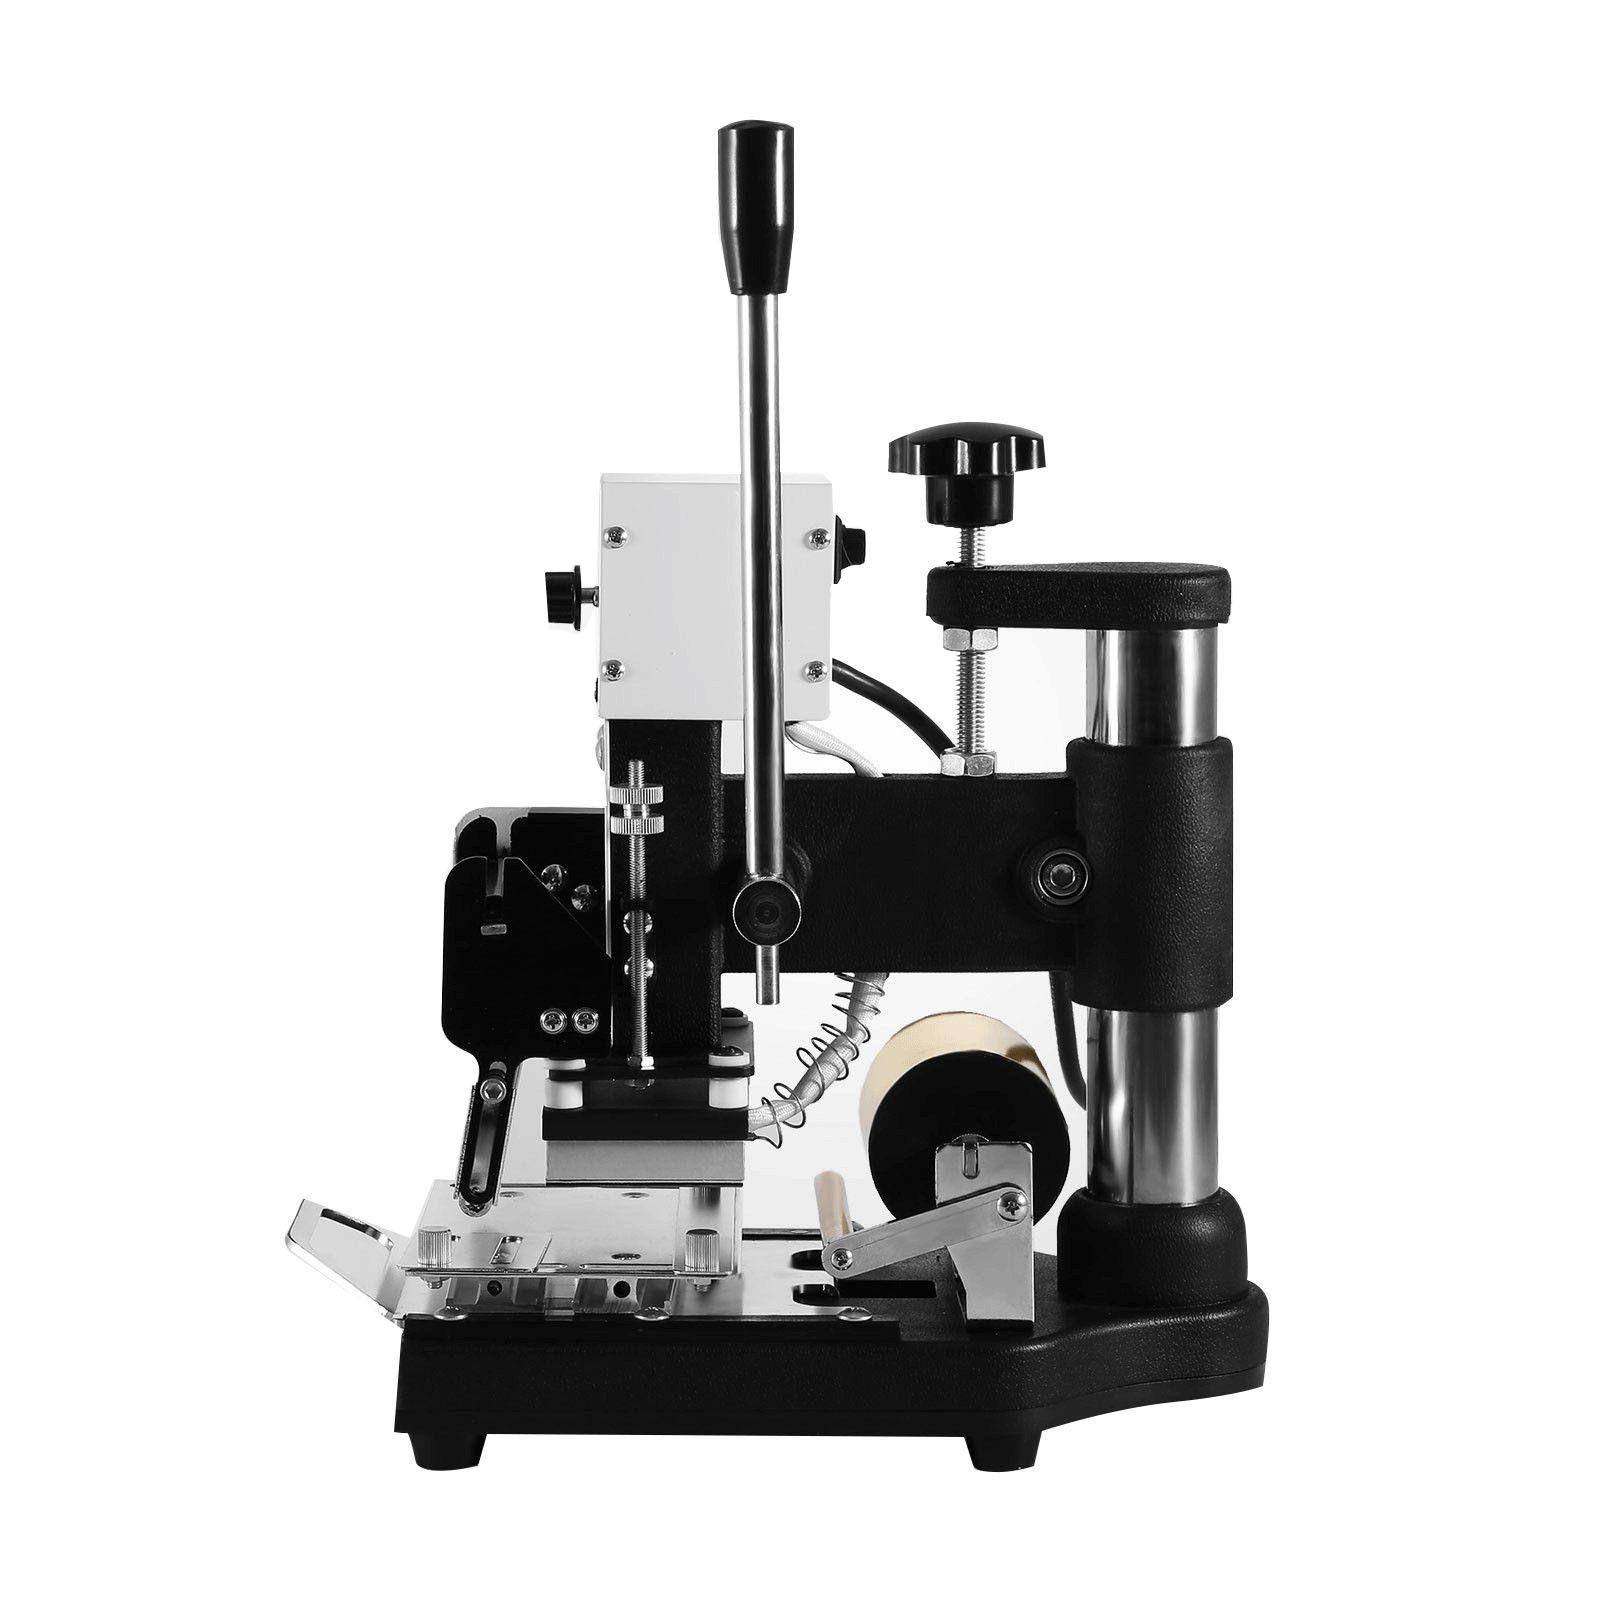 Finlon hot foil stamping machine tipper stamper bronzing